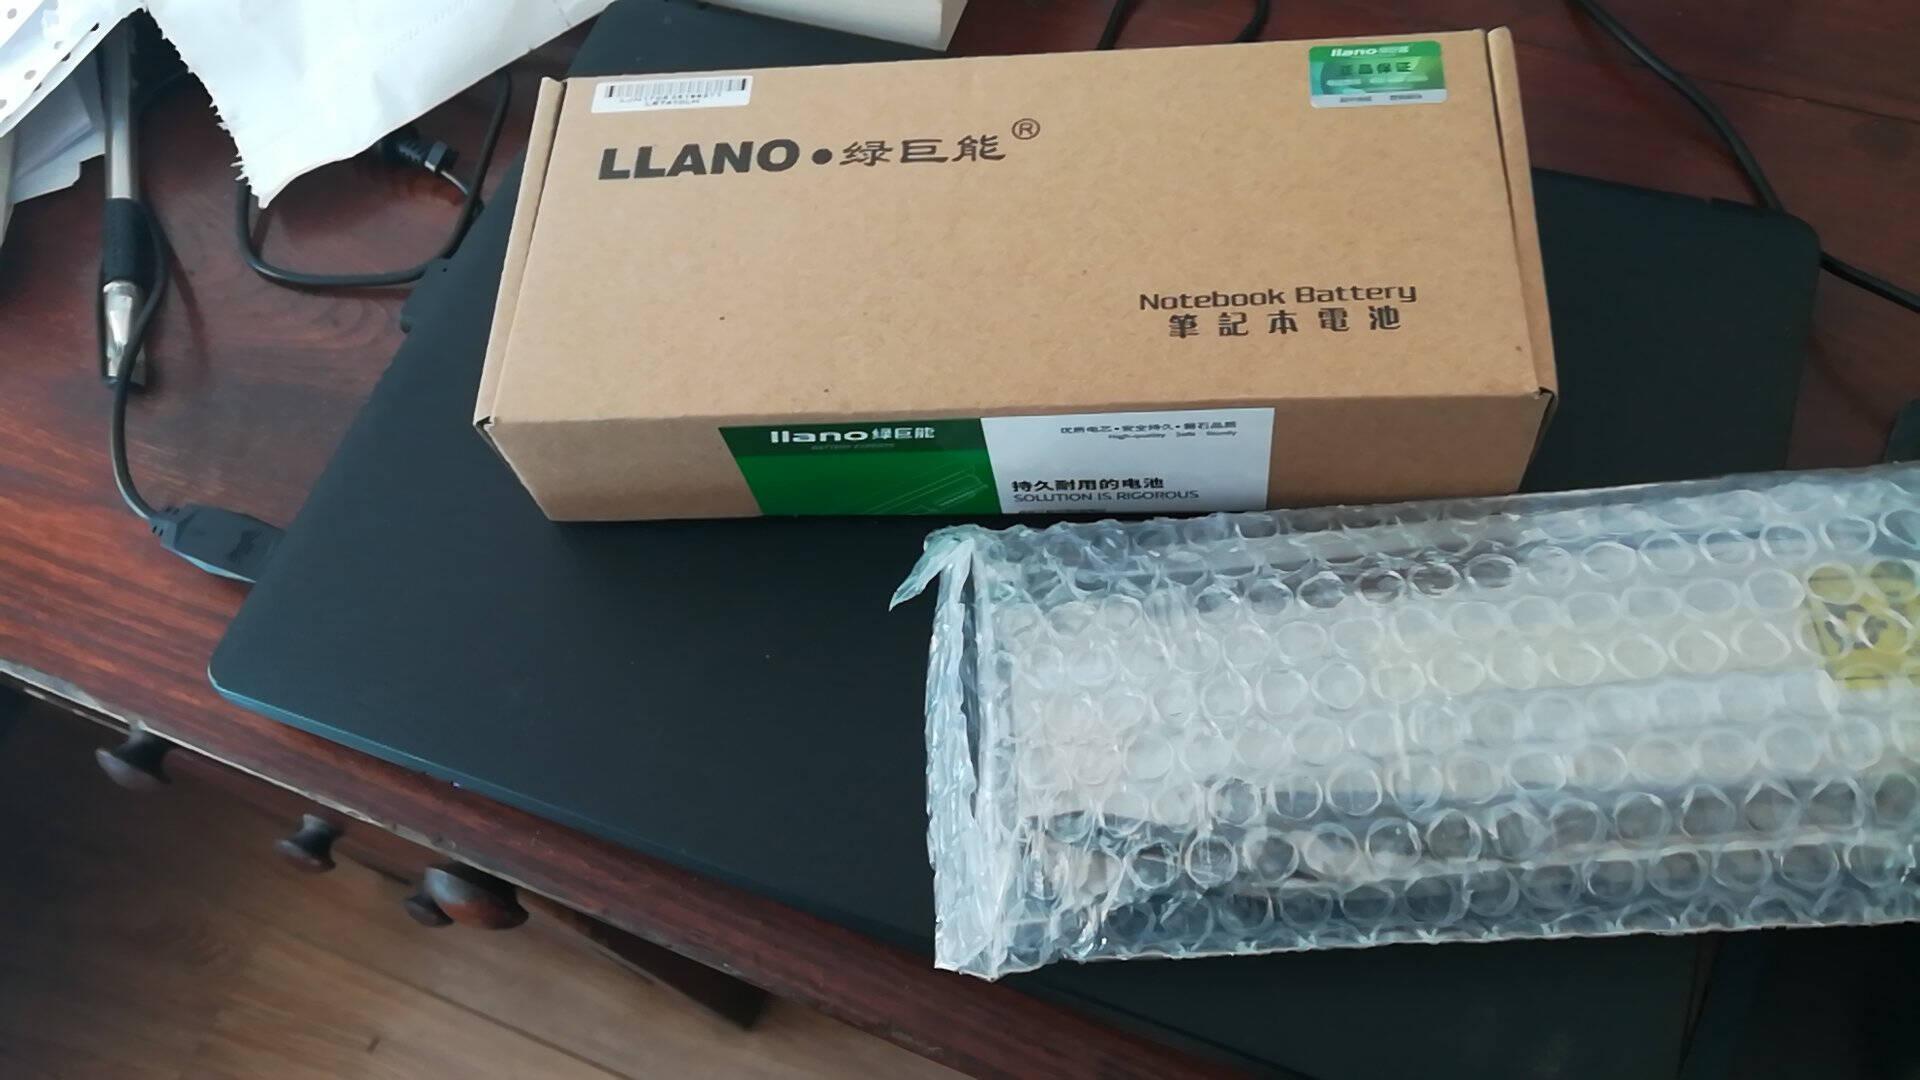 绿巨能(llano)联想笔记本电池E40E50E420E520L410SL410KSL510T410T420T510Thinkpad电脑电池